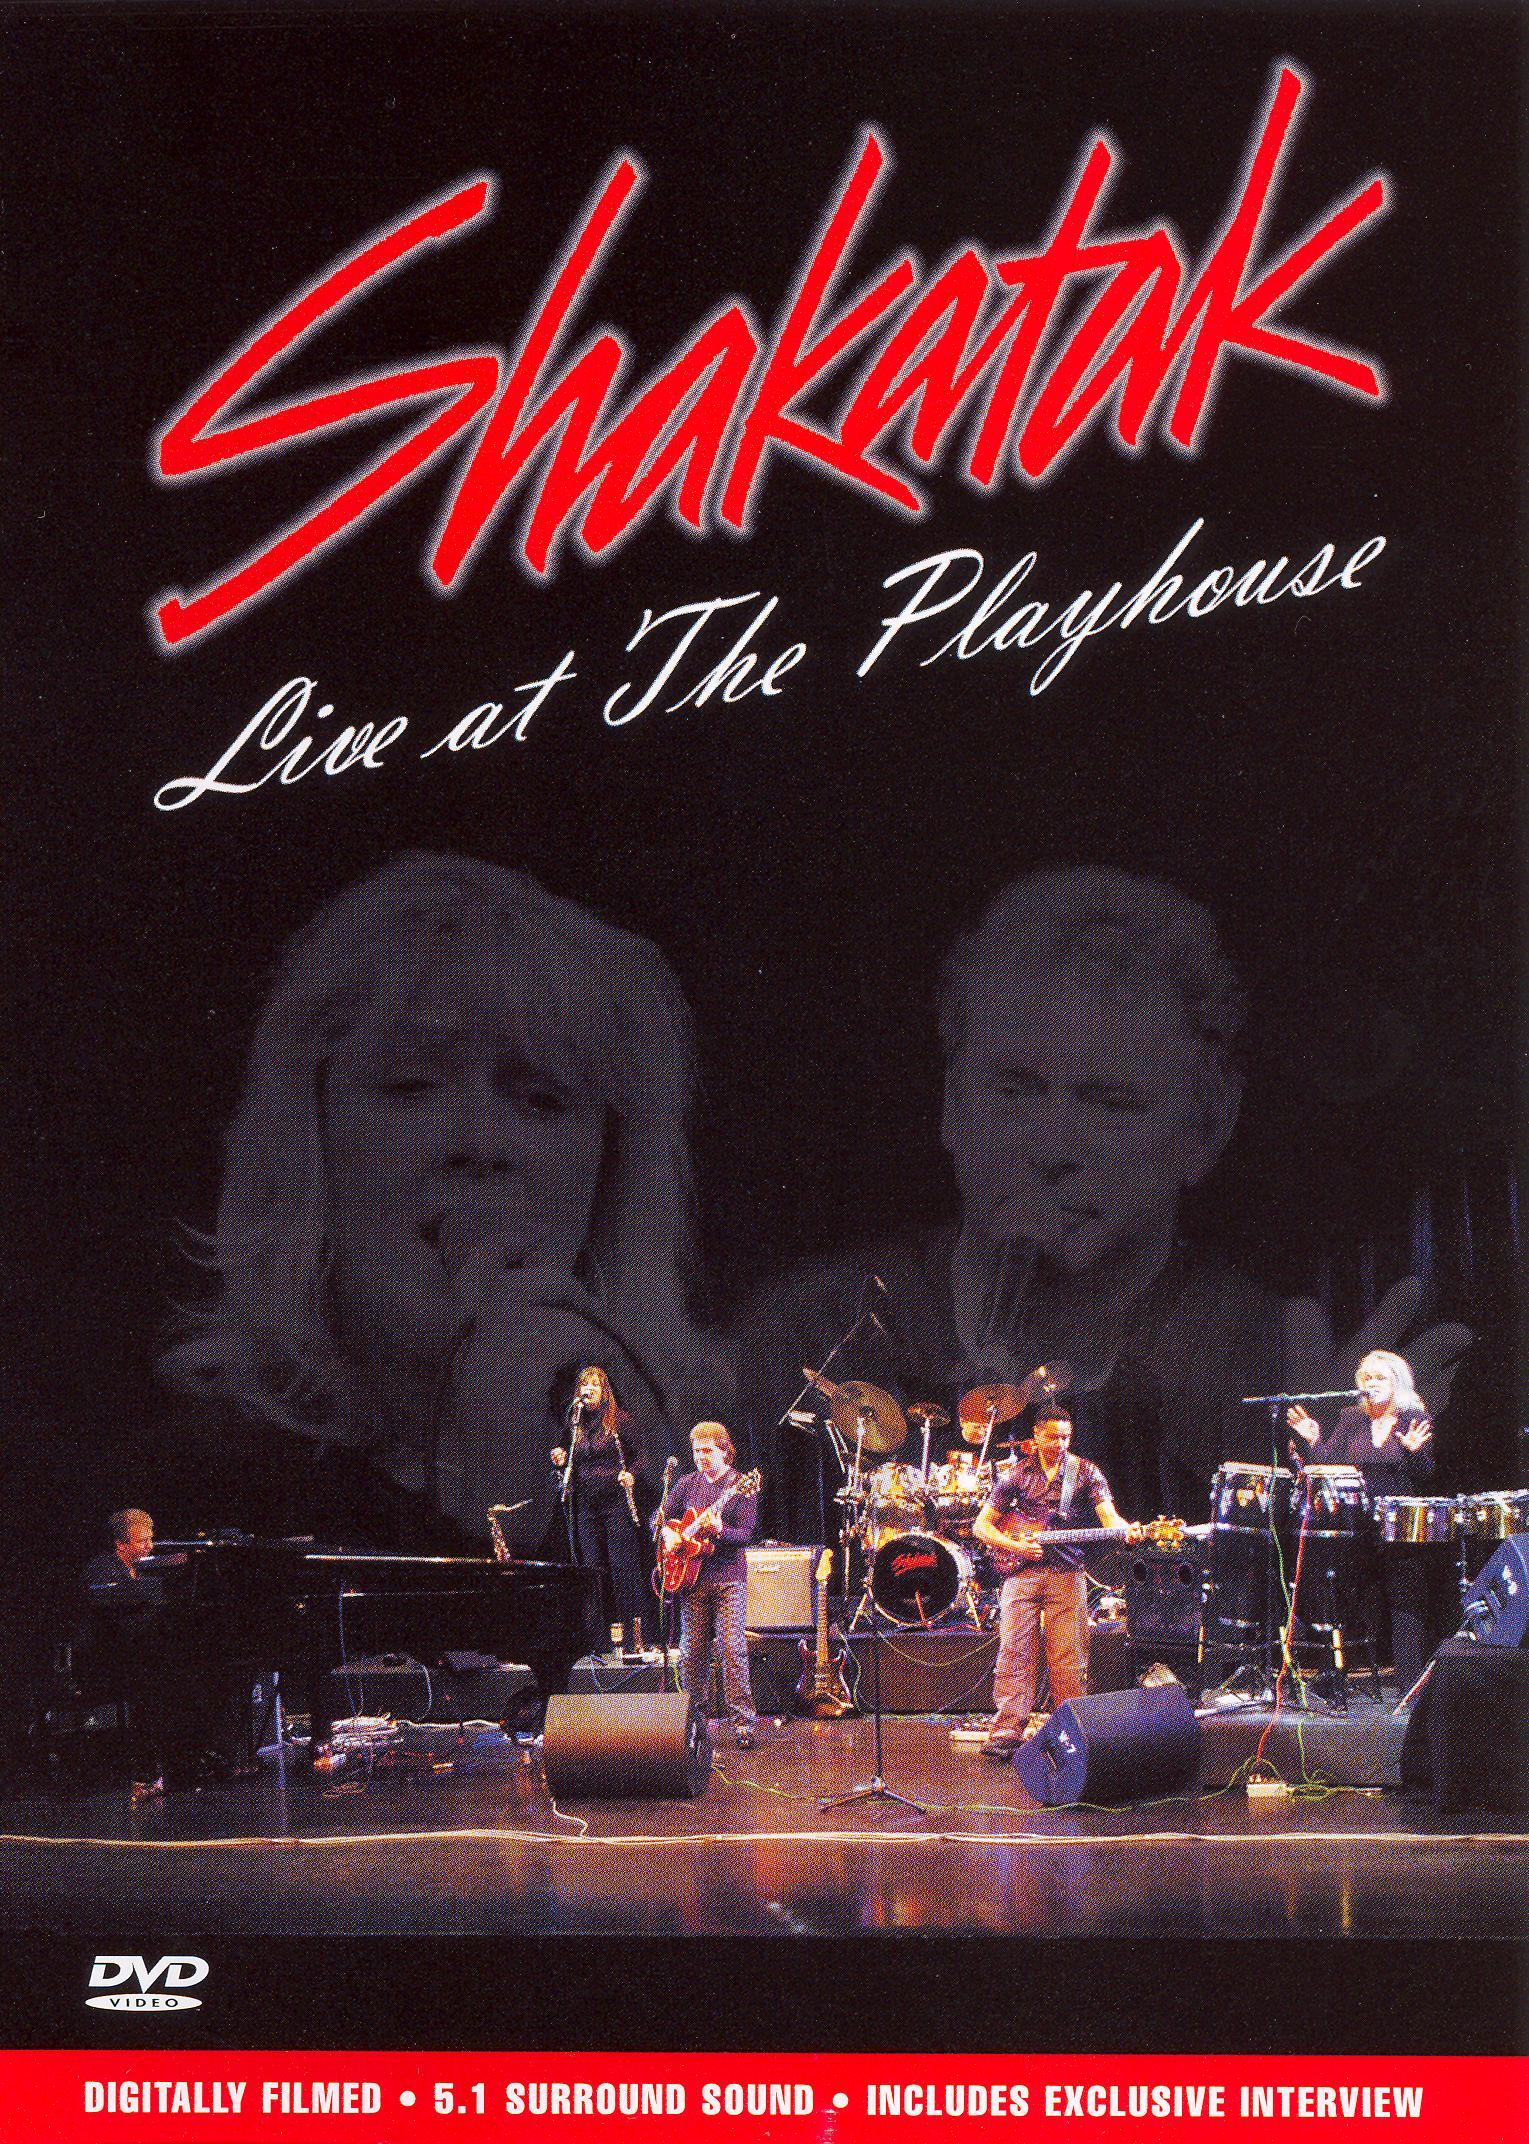 Shakatak: Live at the Playhouse